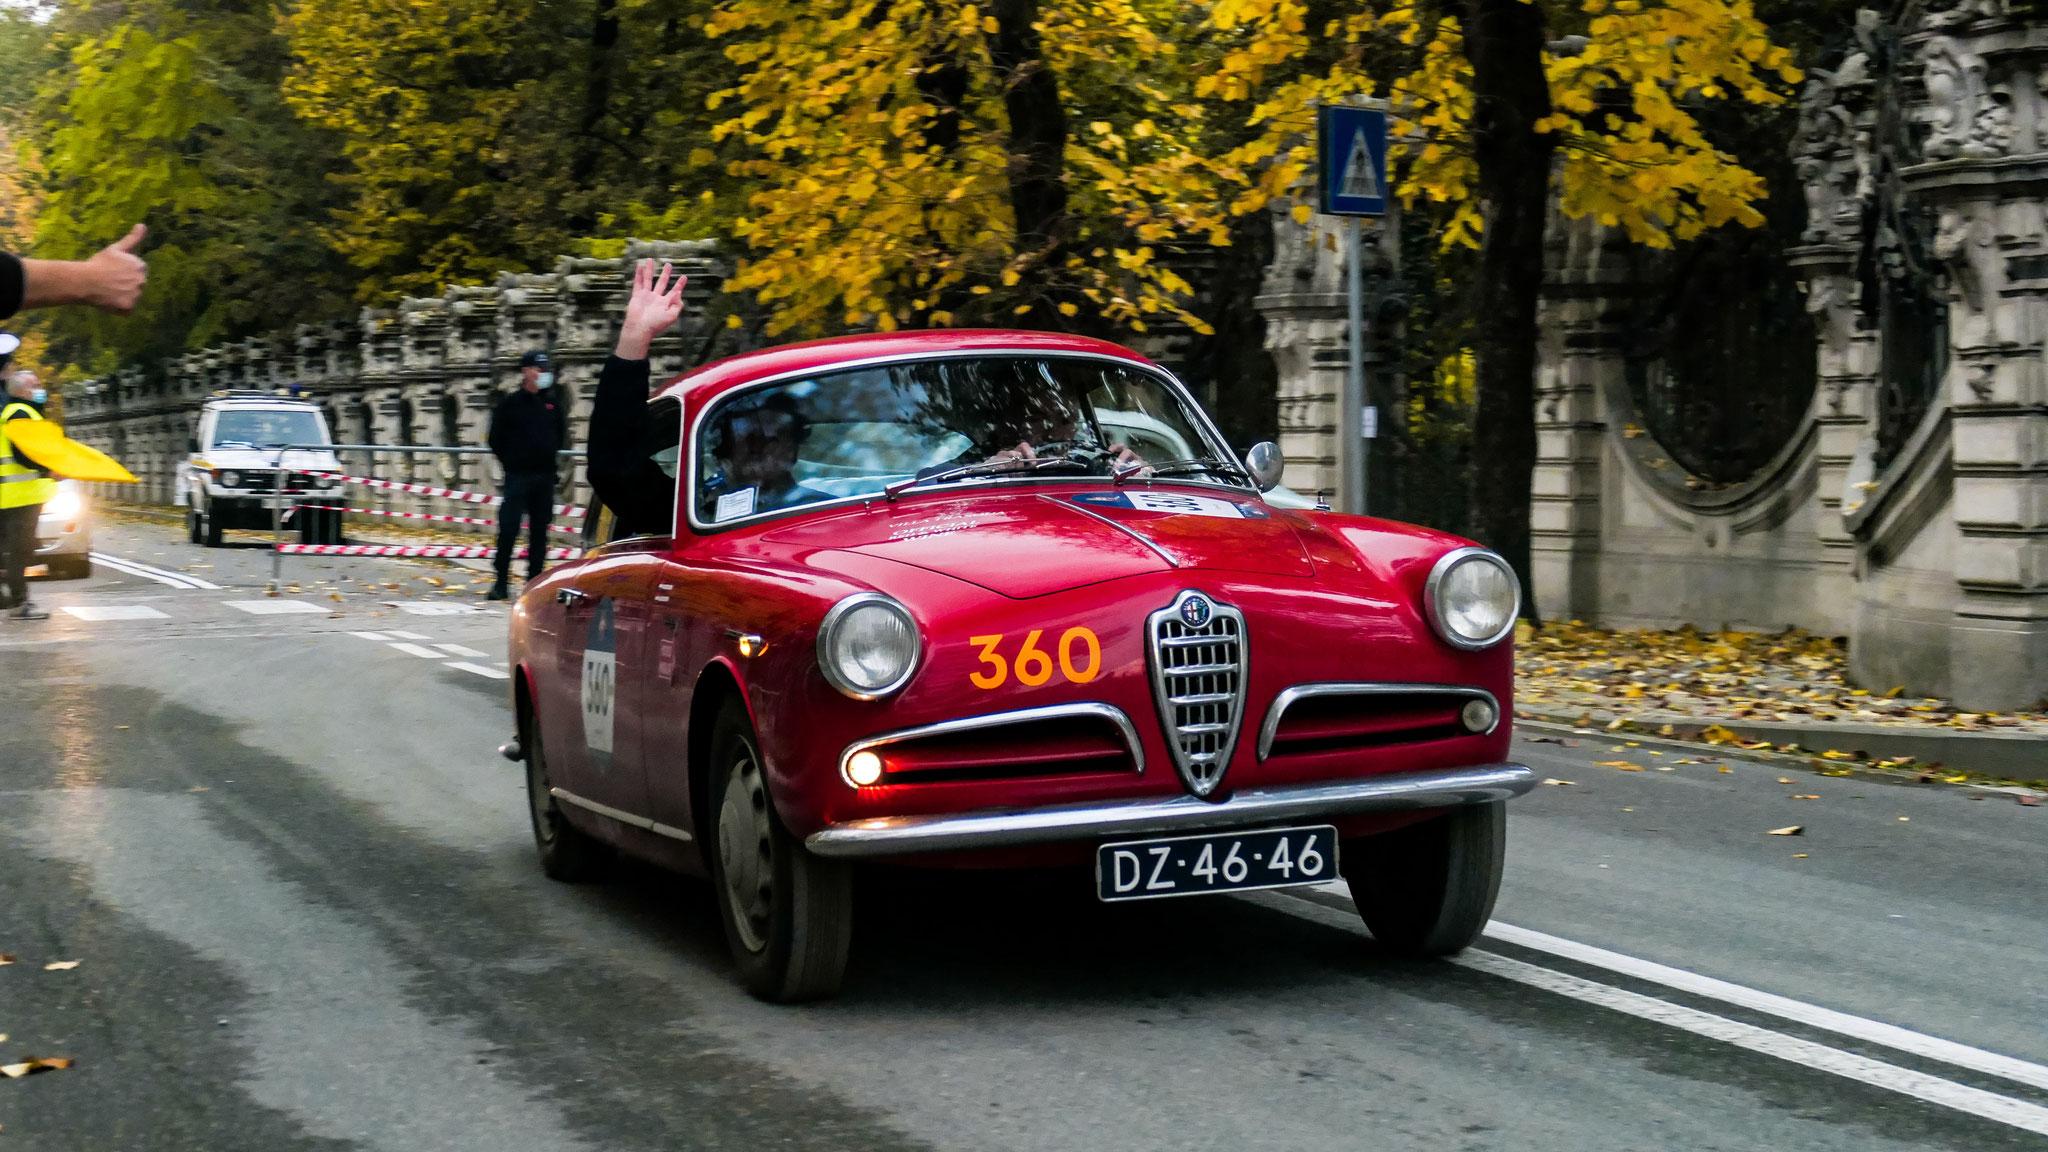 Alfa Romeo Giulietta Sprint - DZ-46-46 (NL)